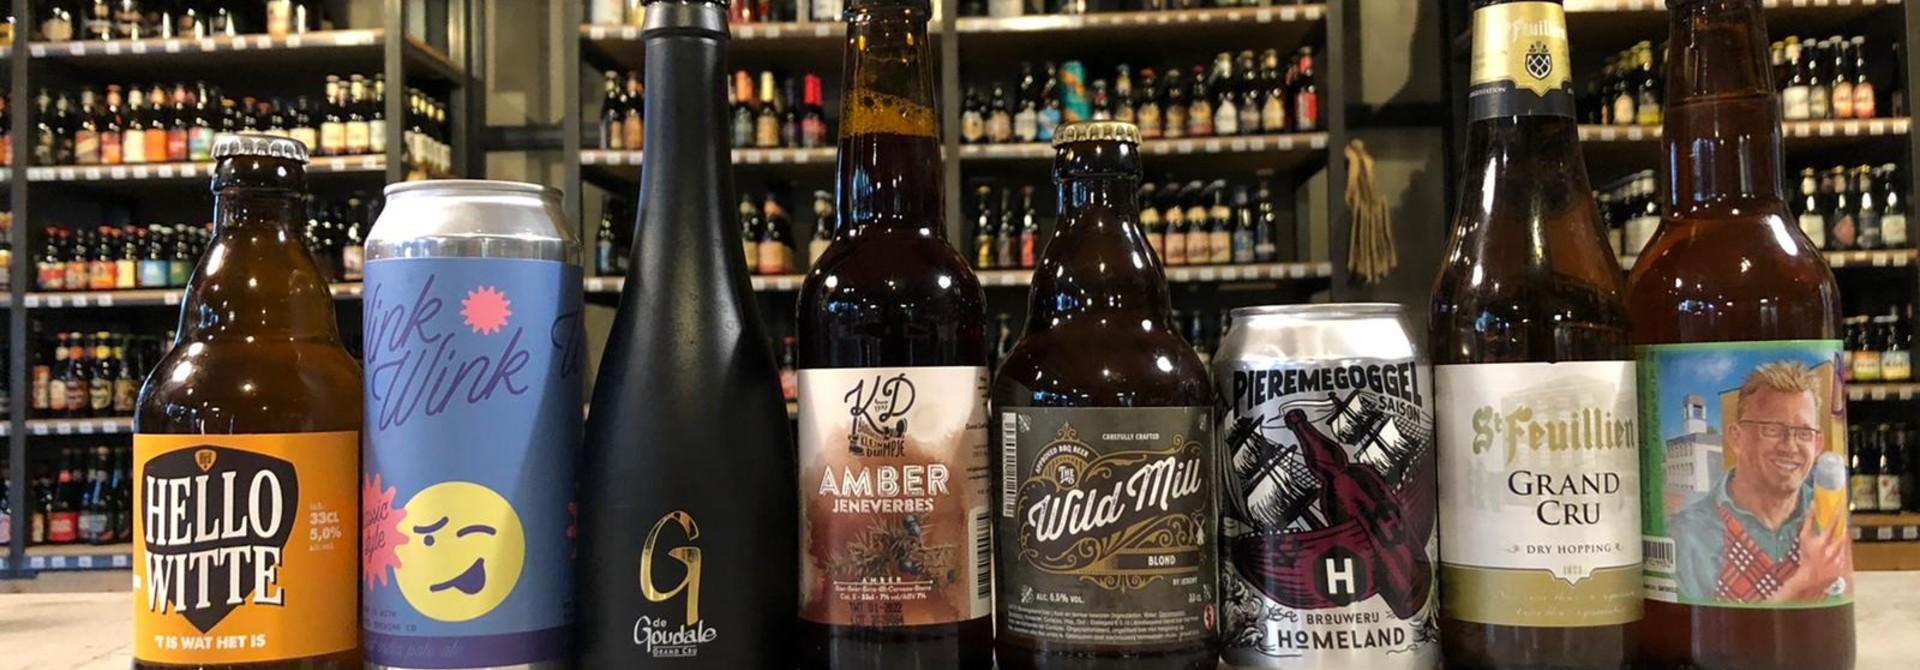 Speciaalbier – bierpakket augustus 2021